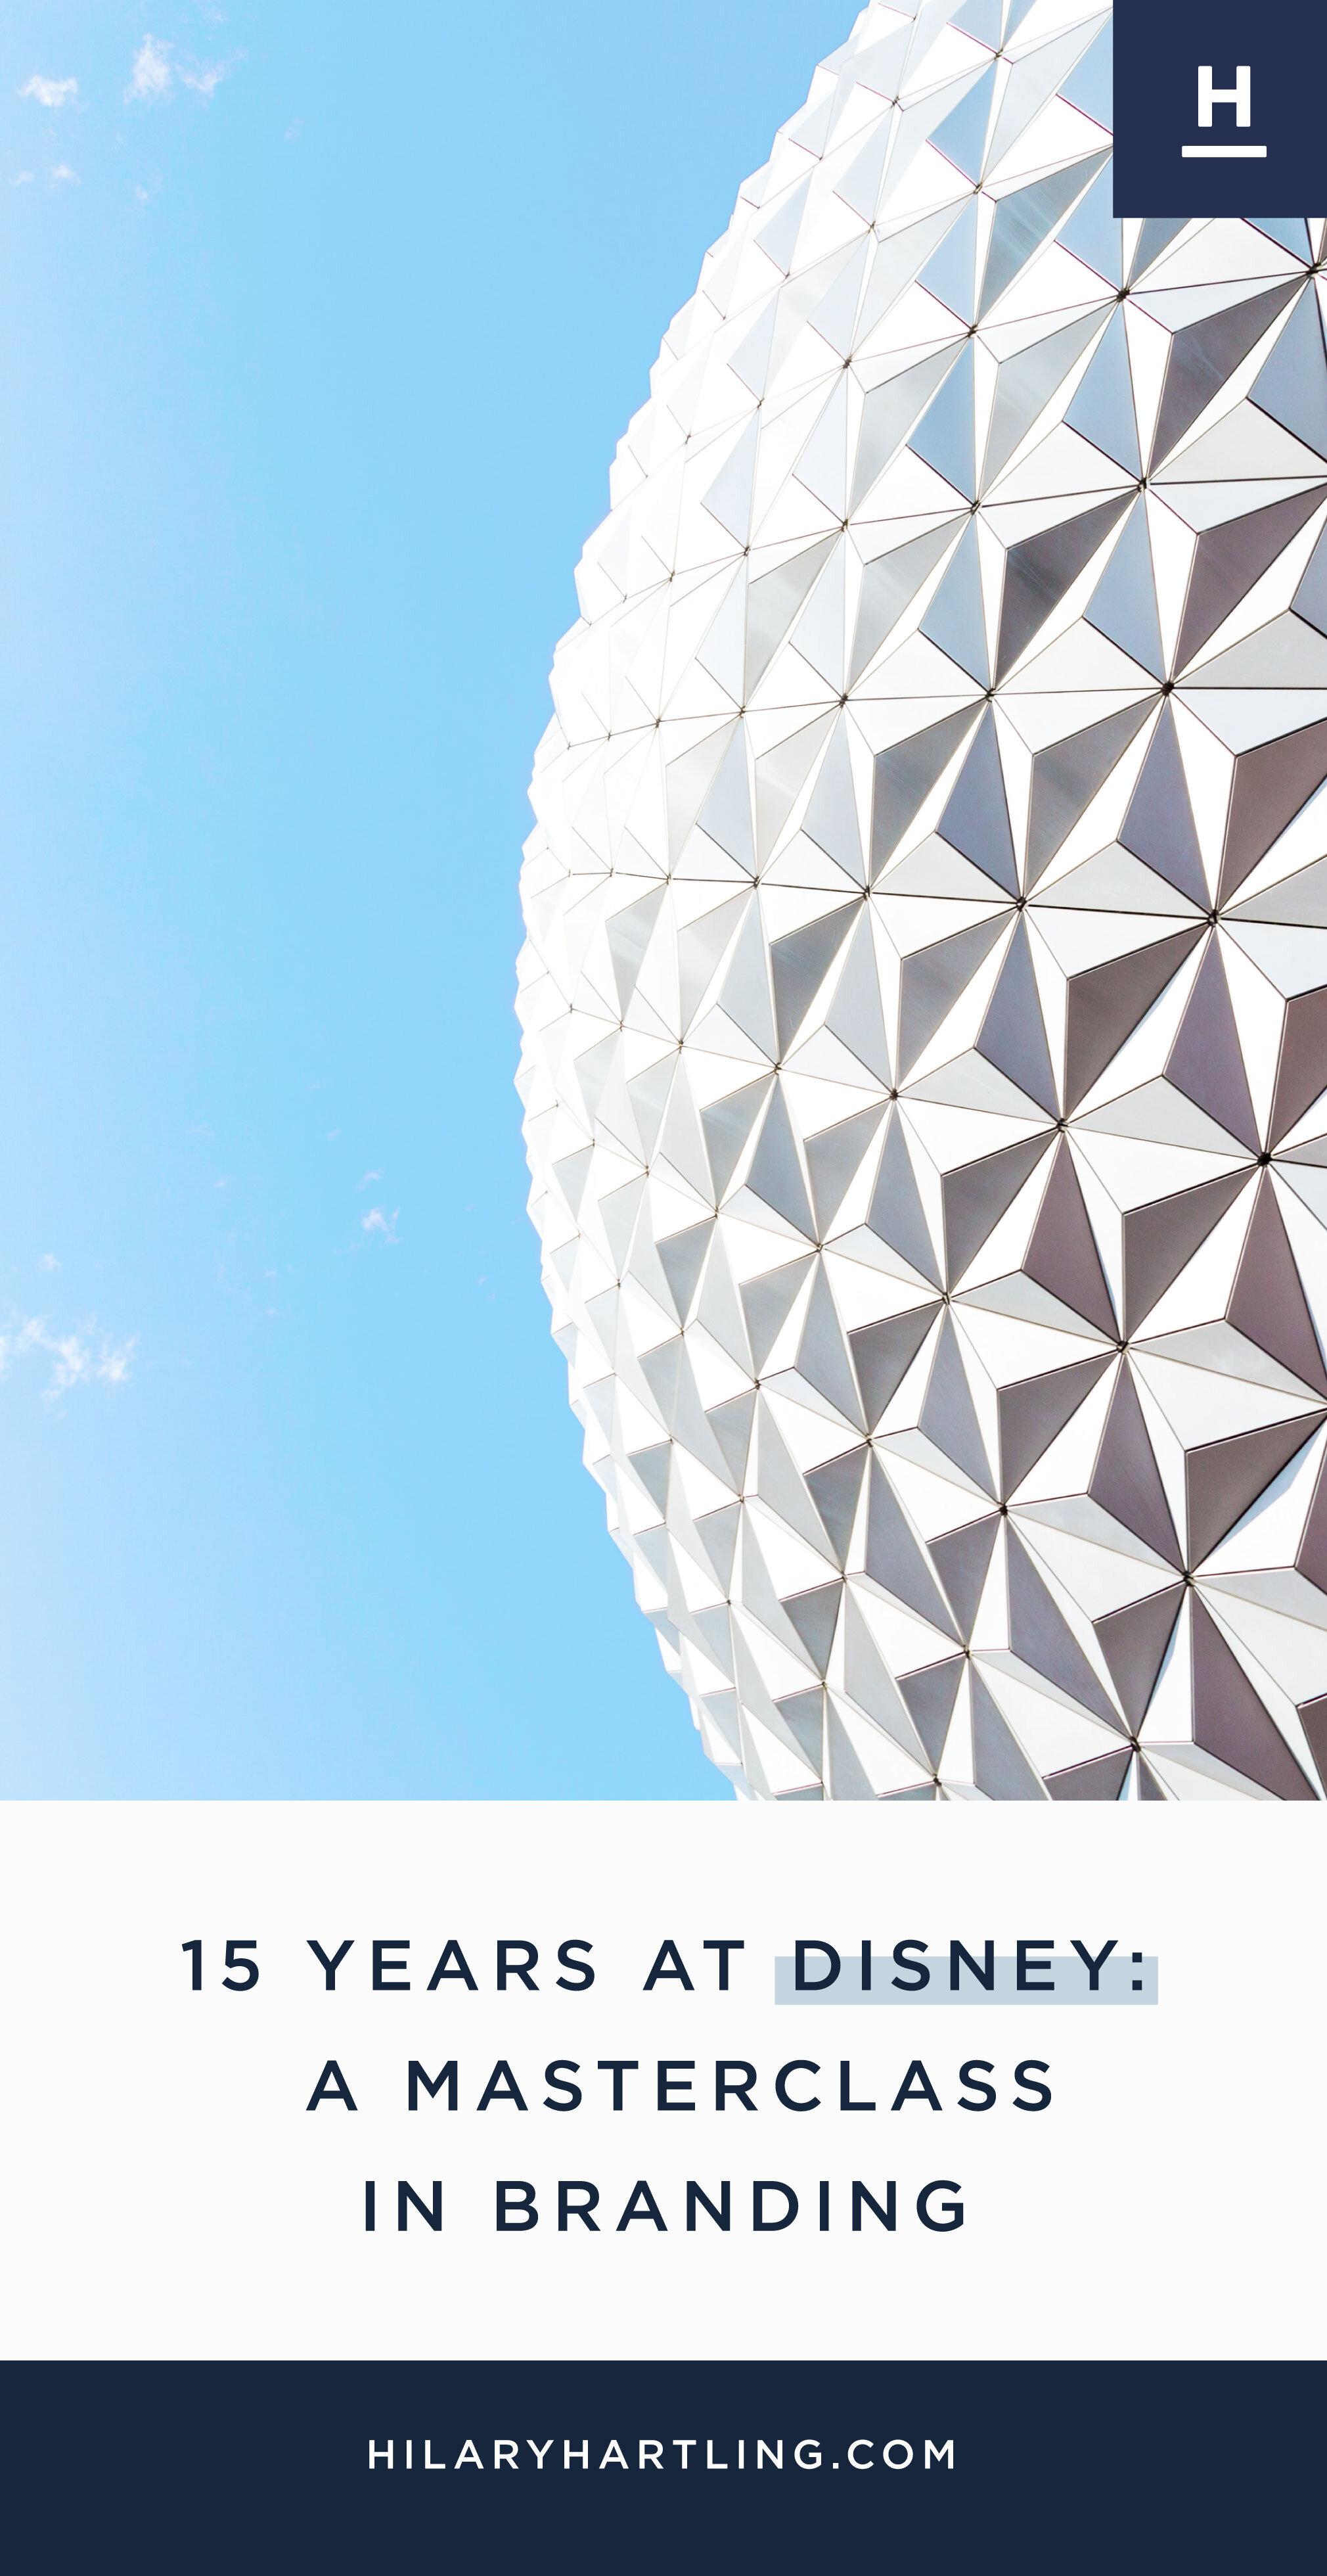 15-Years-At-Disney---A-Masterclass--In-Branding2.jpg